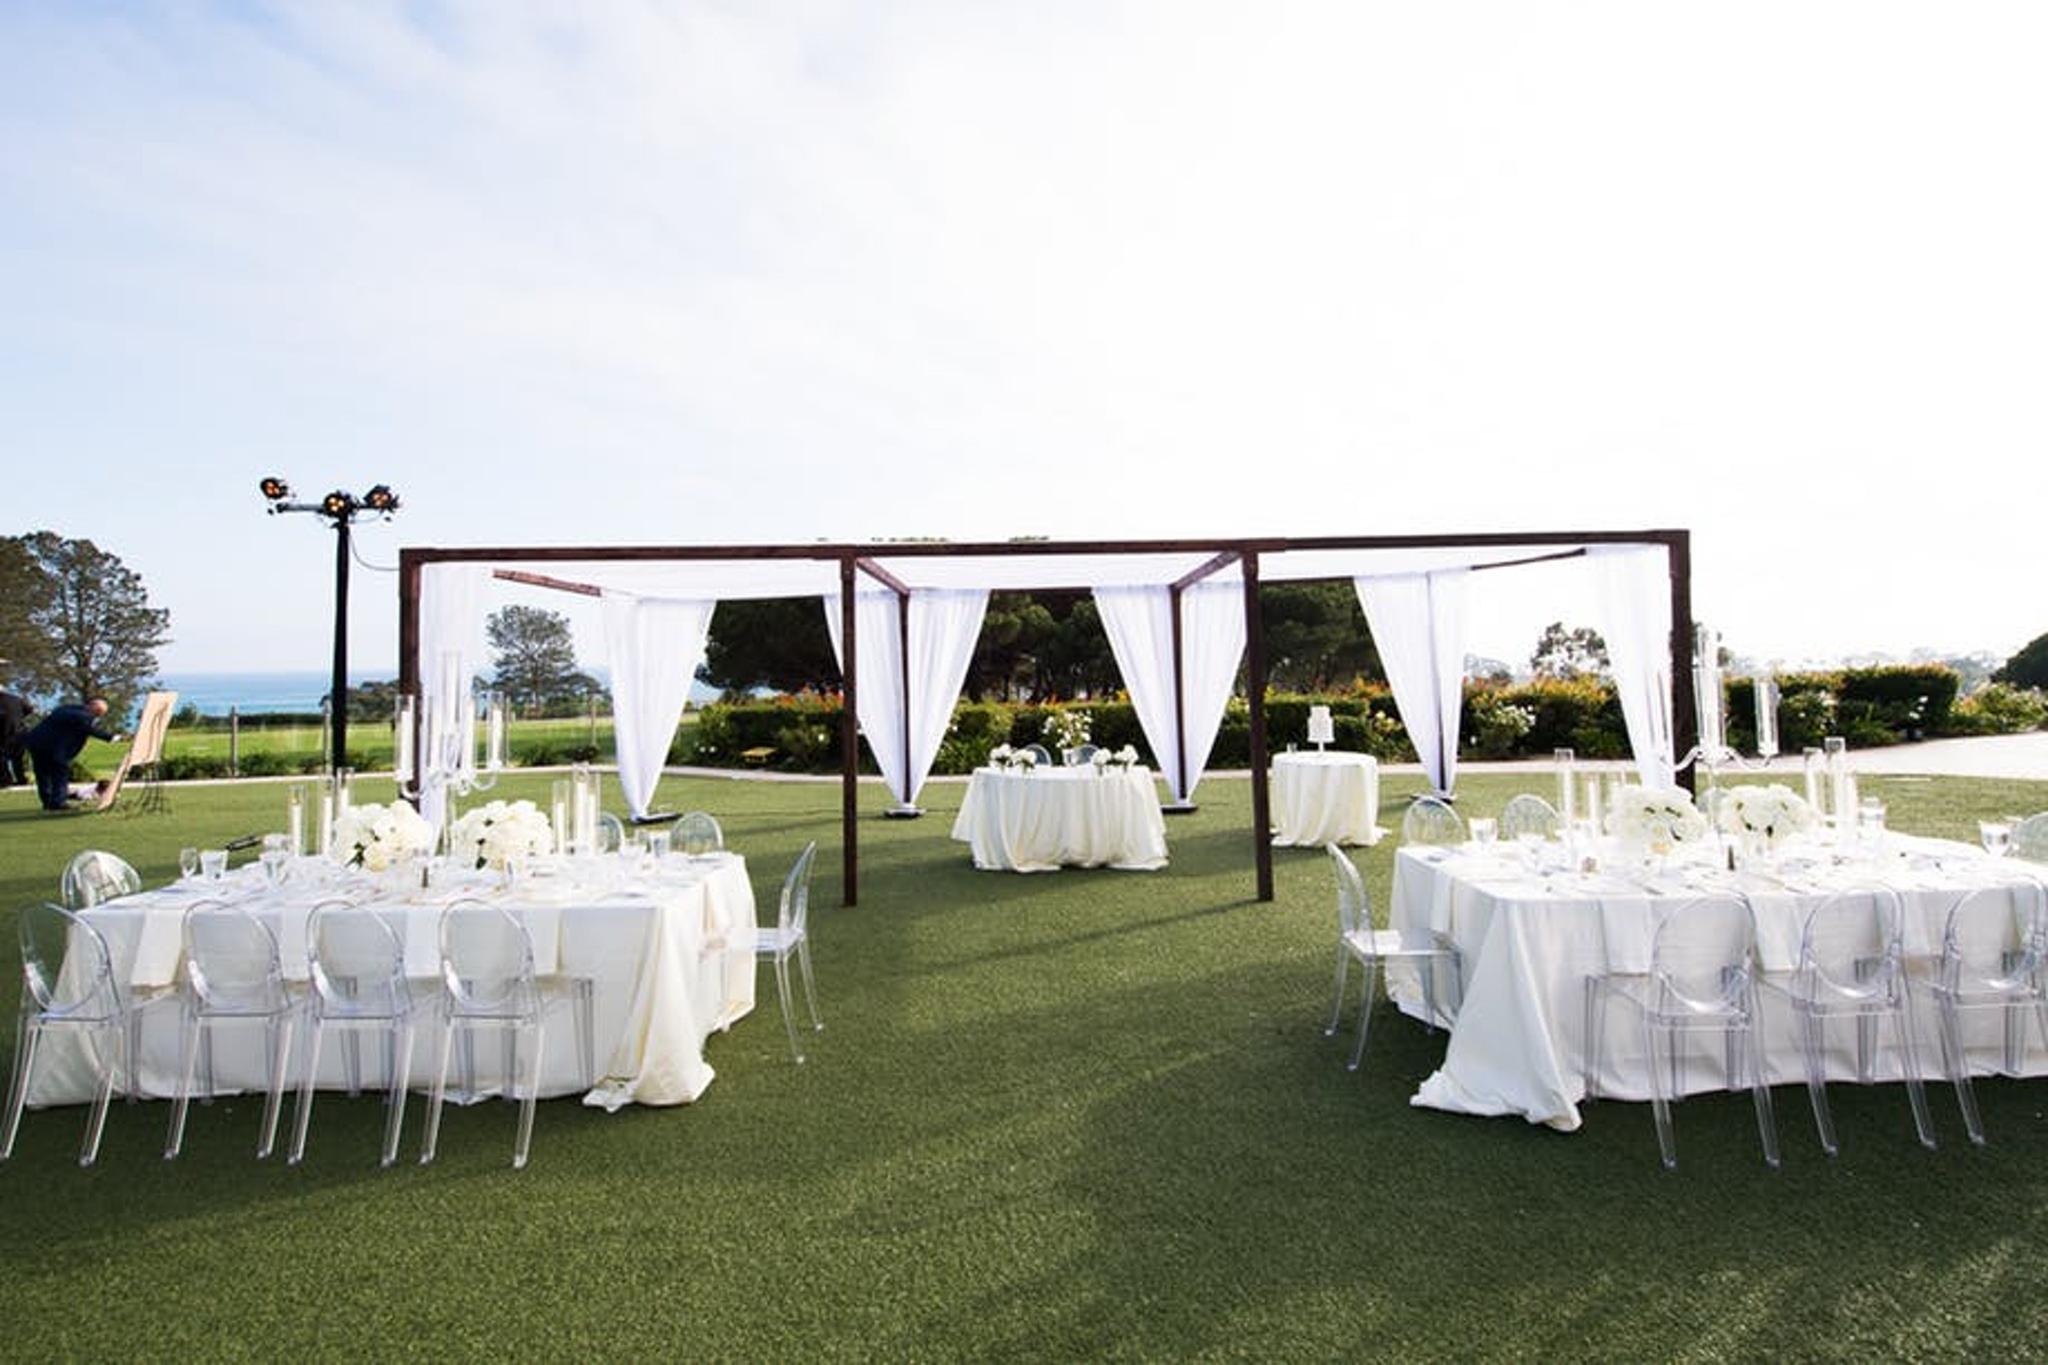 Outdoor wedding venue at Laguna Cliffs Marriott Resort & Spa